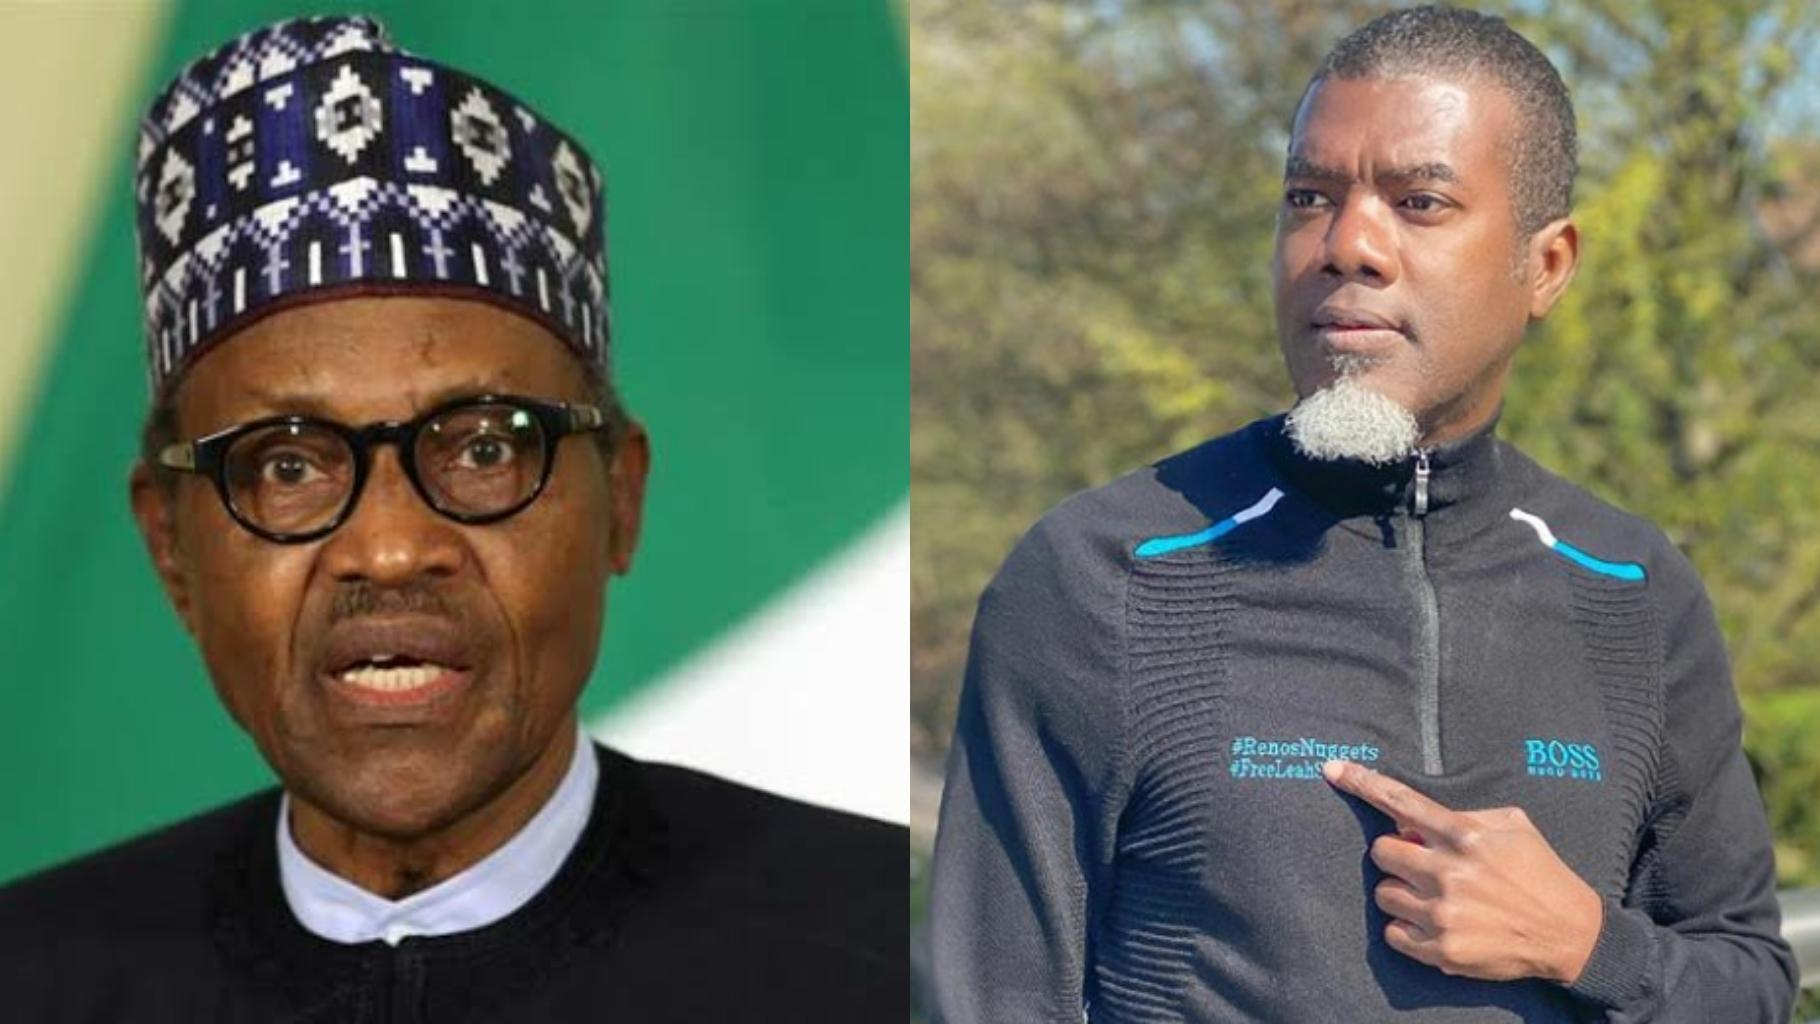 Reno Omokri, President Buhari, Coronavirus, Nigeria, Abba kyari, Atiku, Breaking news, Breaking, Entertainment news